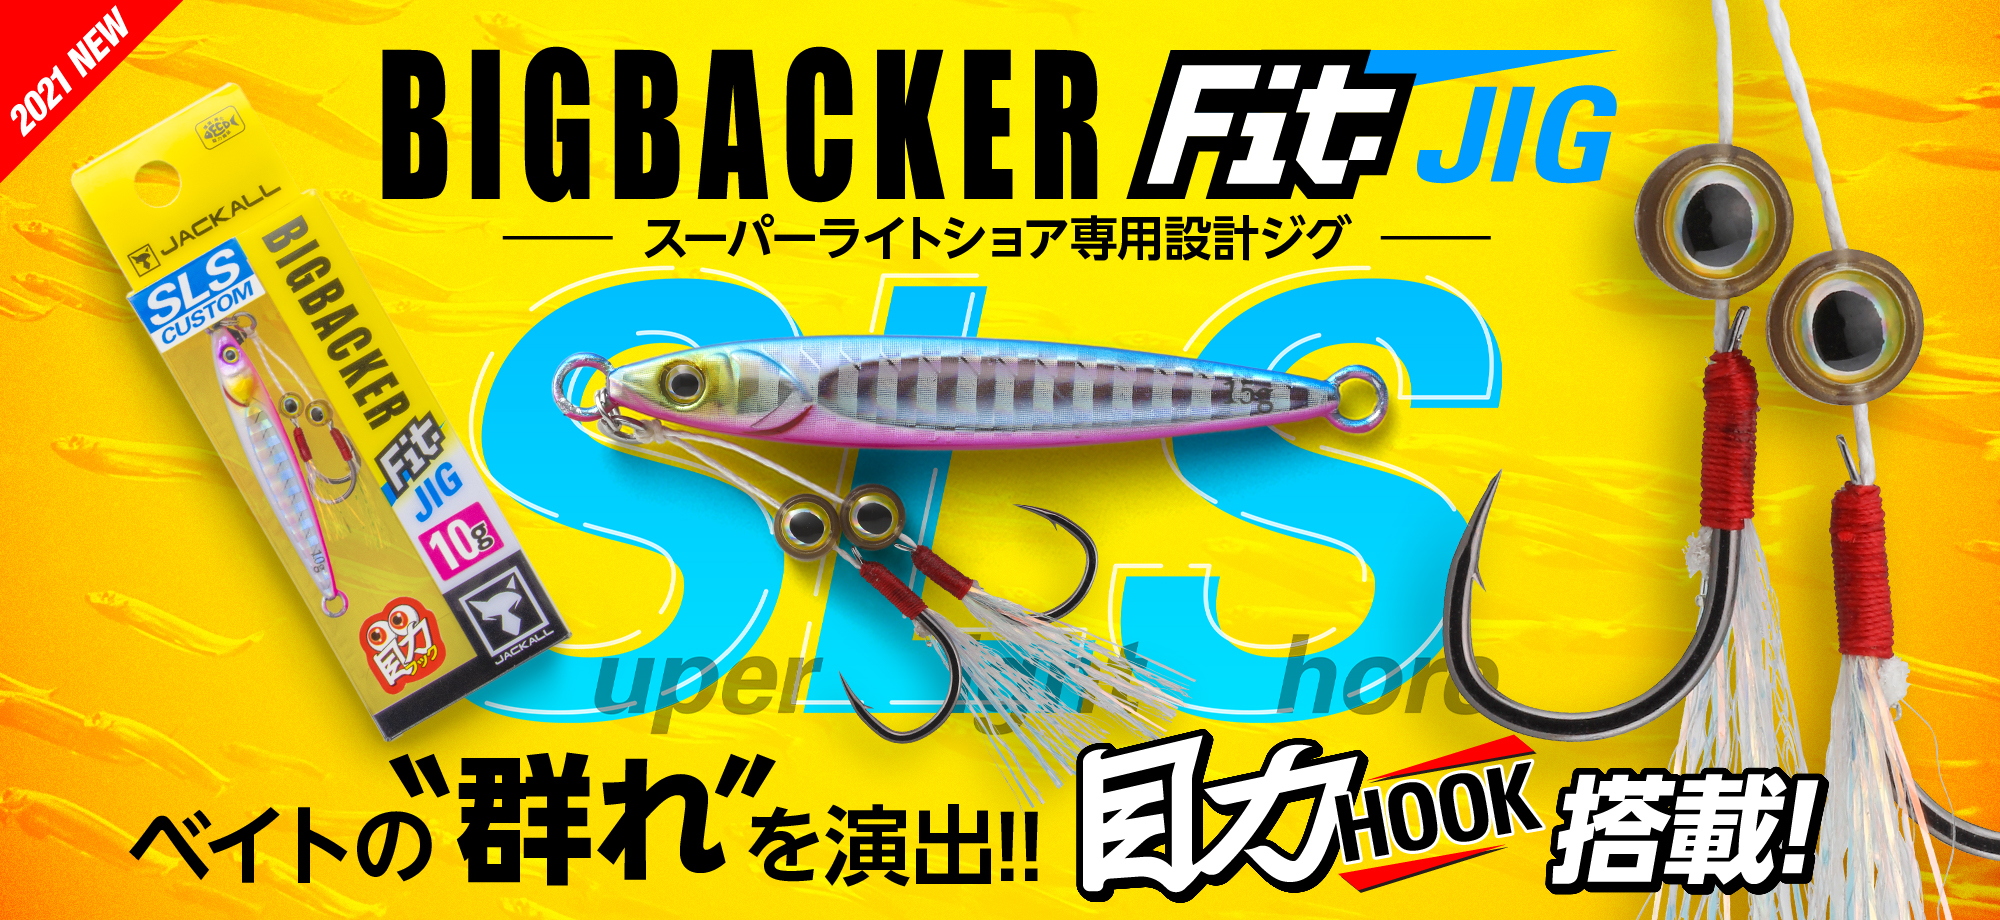 BIGBACKER FitJIG/ ビッグバッカーフィットジグ